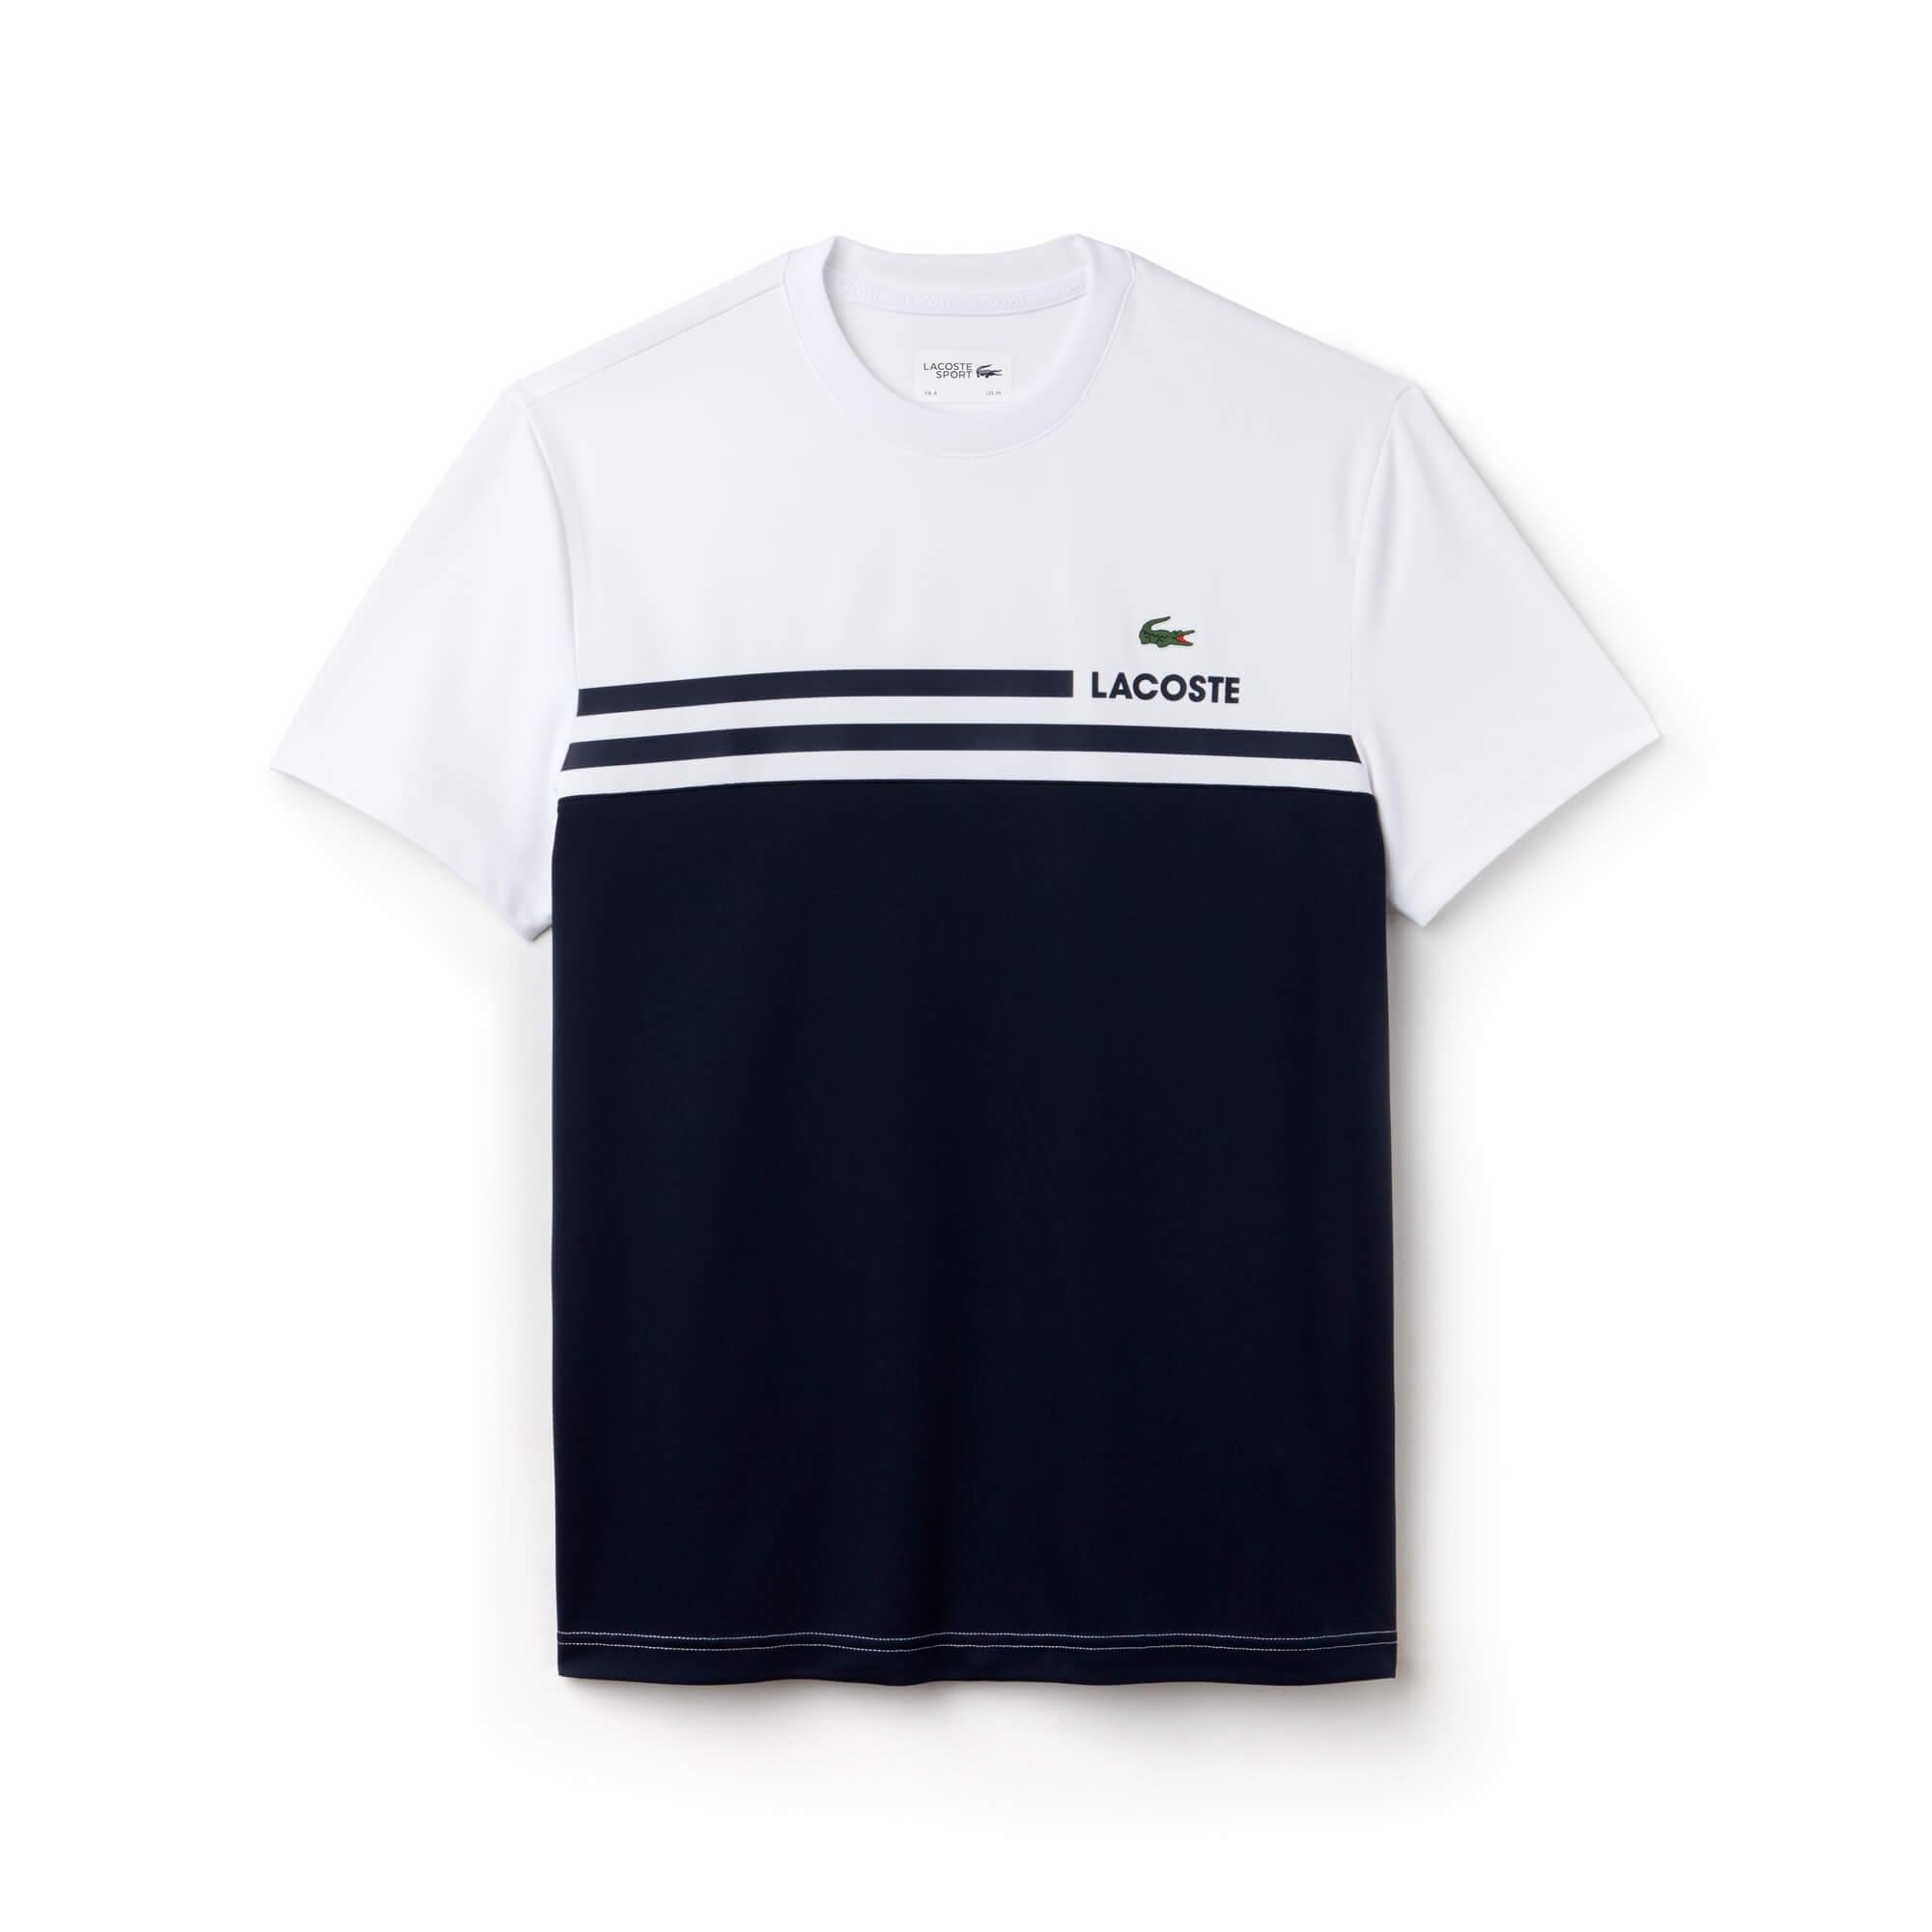 Lacoste Erkek Spor Beyaz T-Shirt